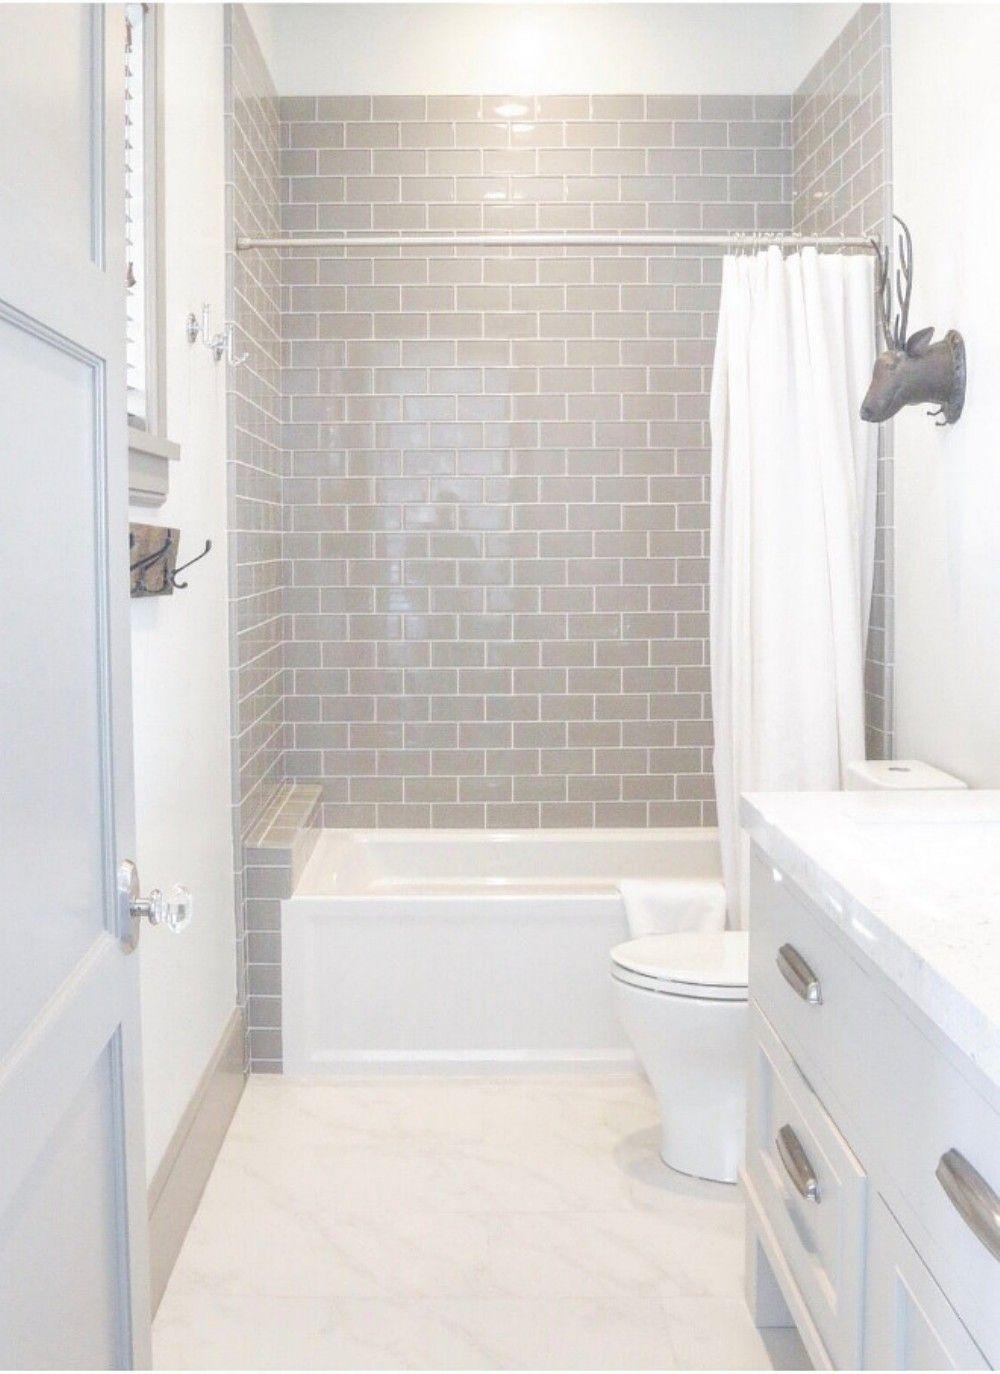 Breathtaking Cozy Small Bathroom Shower with tub Tile Design Ideas ...